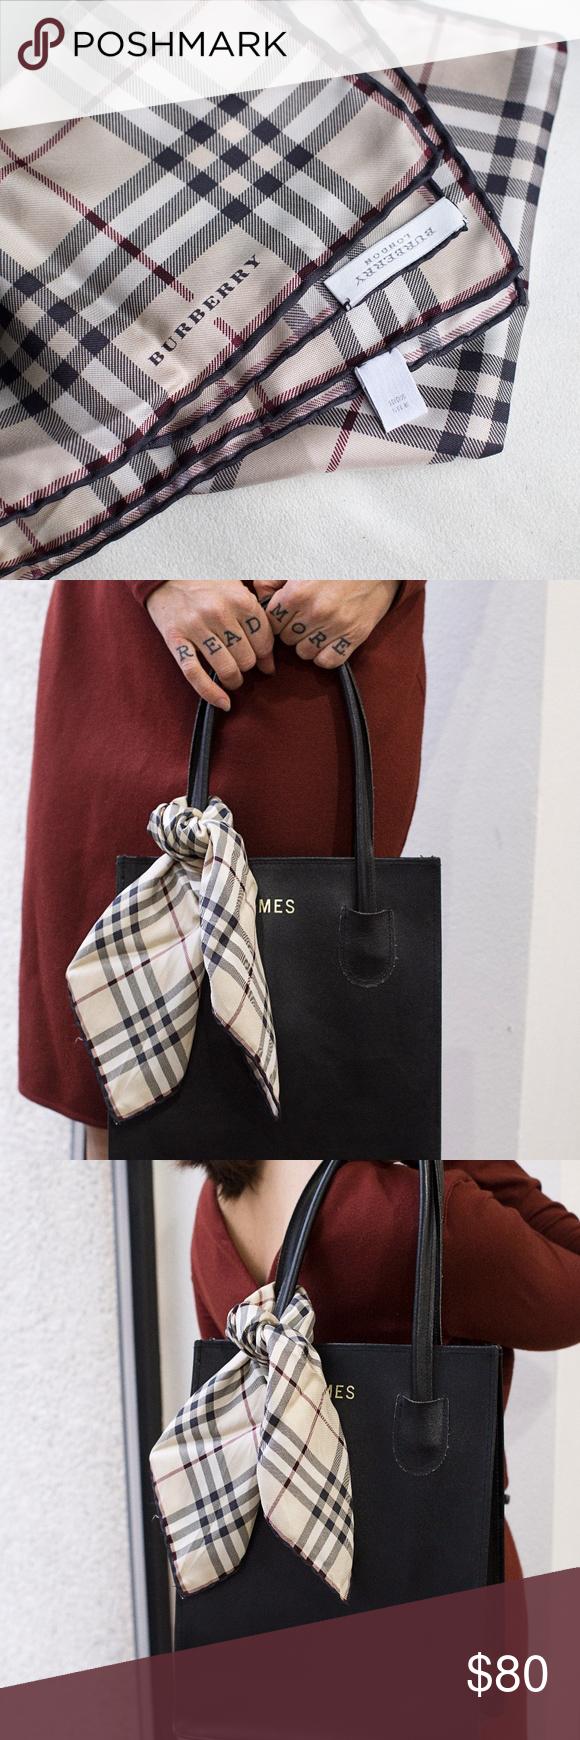 Burberry 100 Silk Scarf Handkerchief Scarf Accessory Clothes Design Fashion Tips